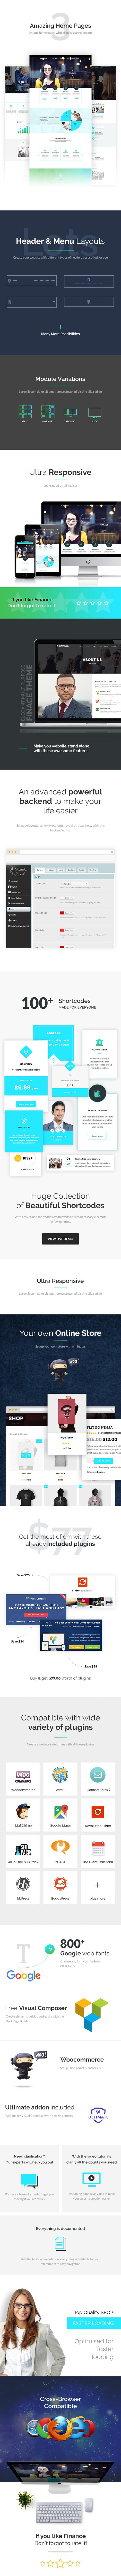 WordPress theme Finance | Multipurpose Money / Finance Theme (Business)